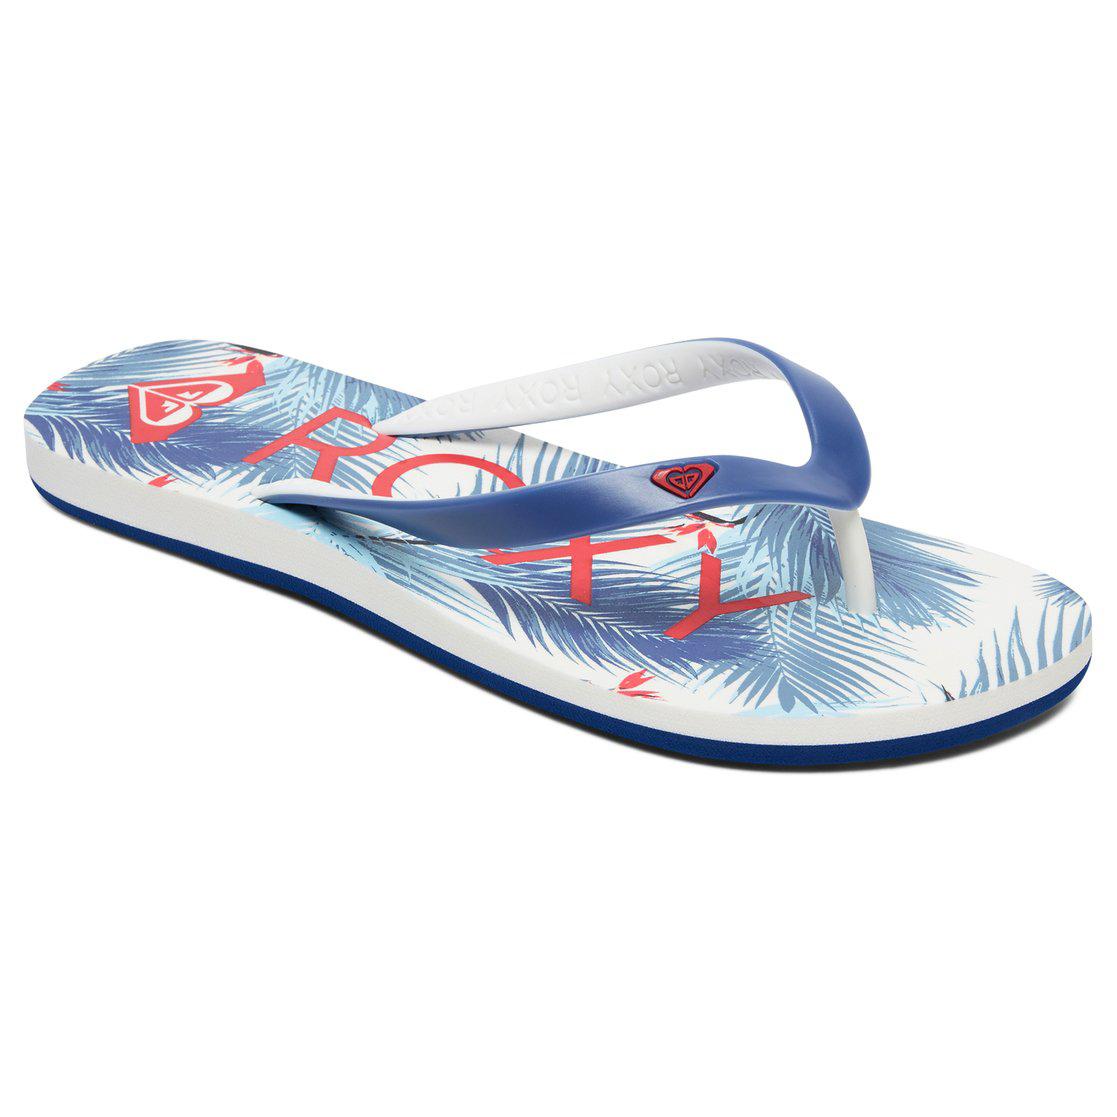 Roxy Women's Tahiti Vi Flip-Flops - Blue, 8